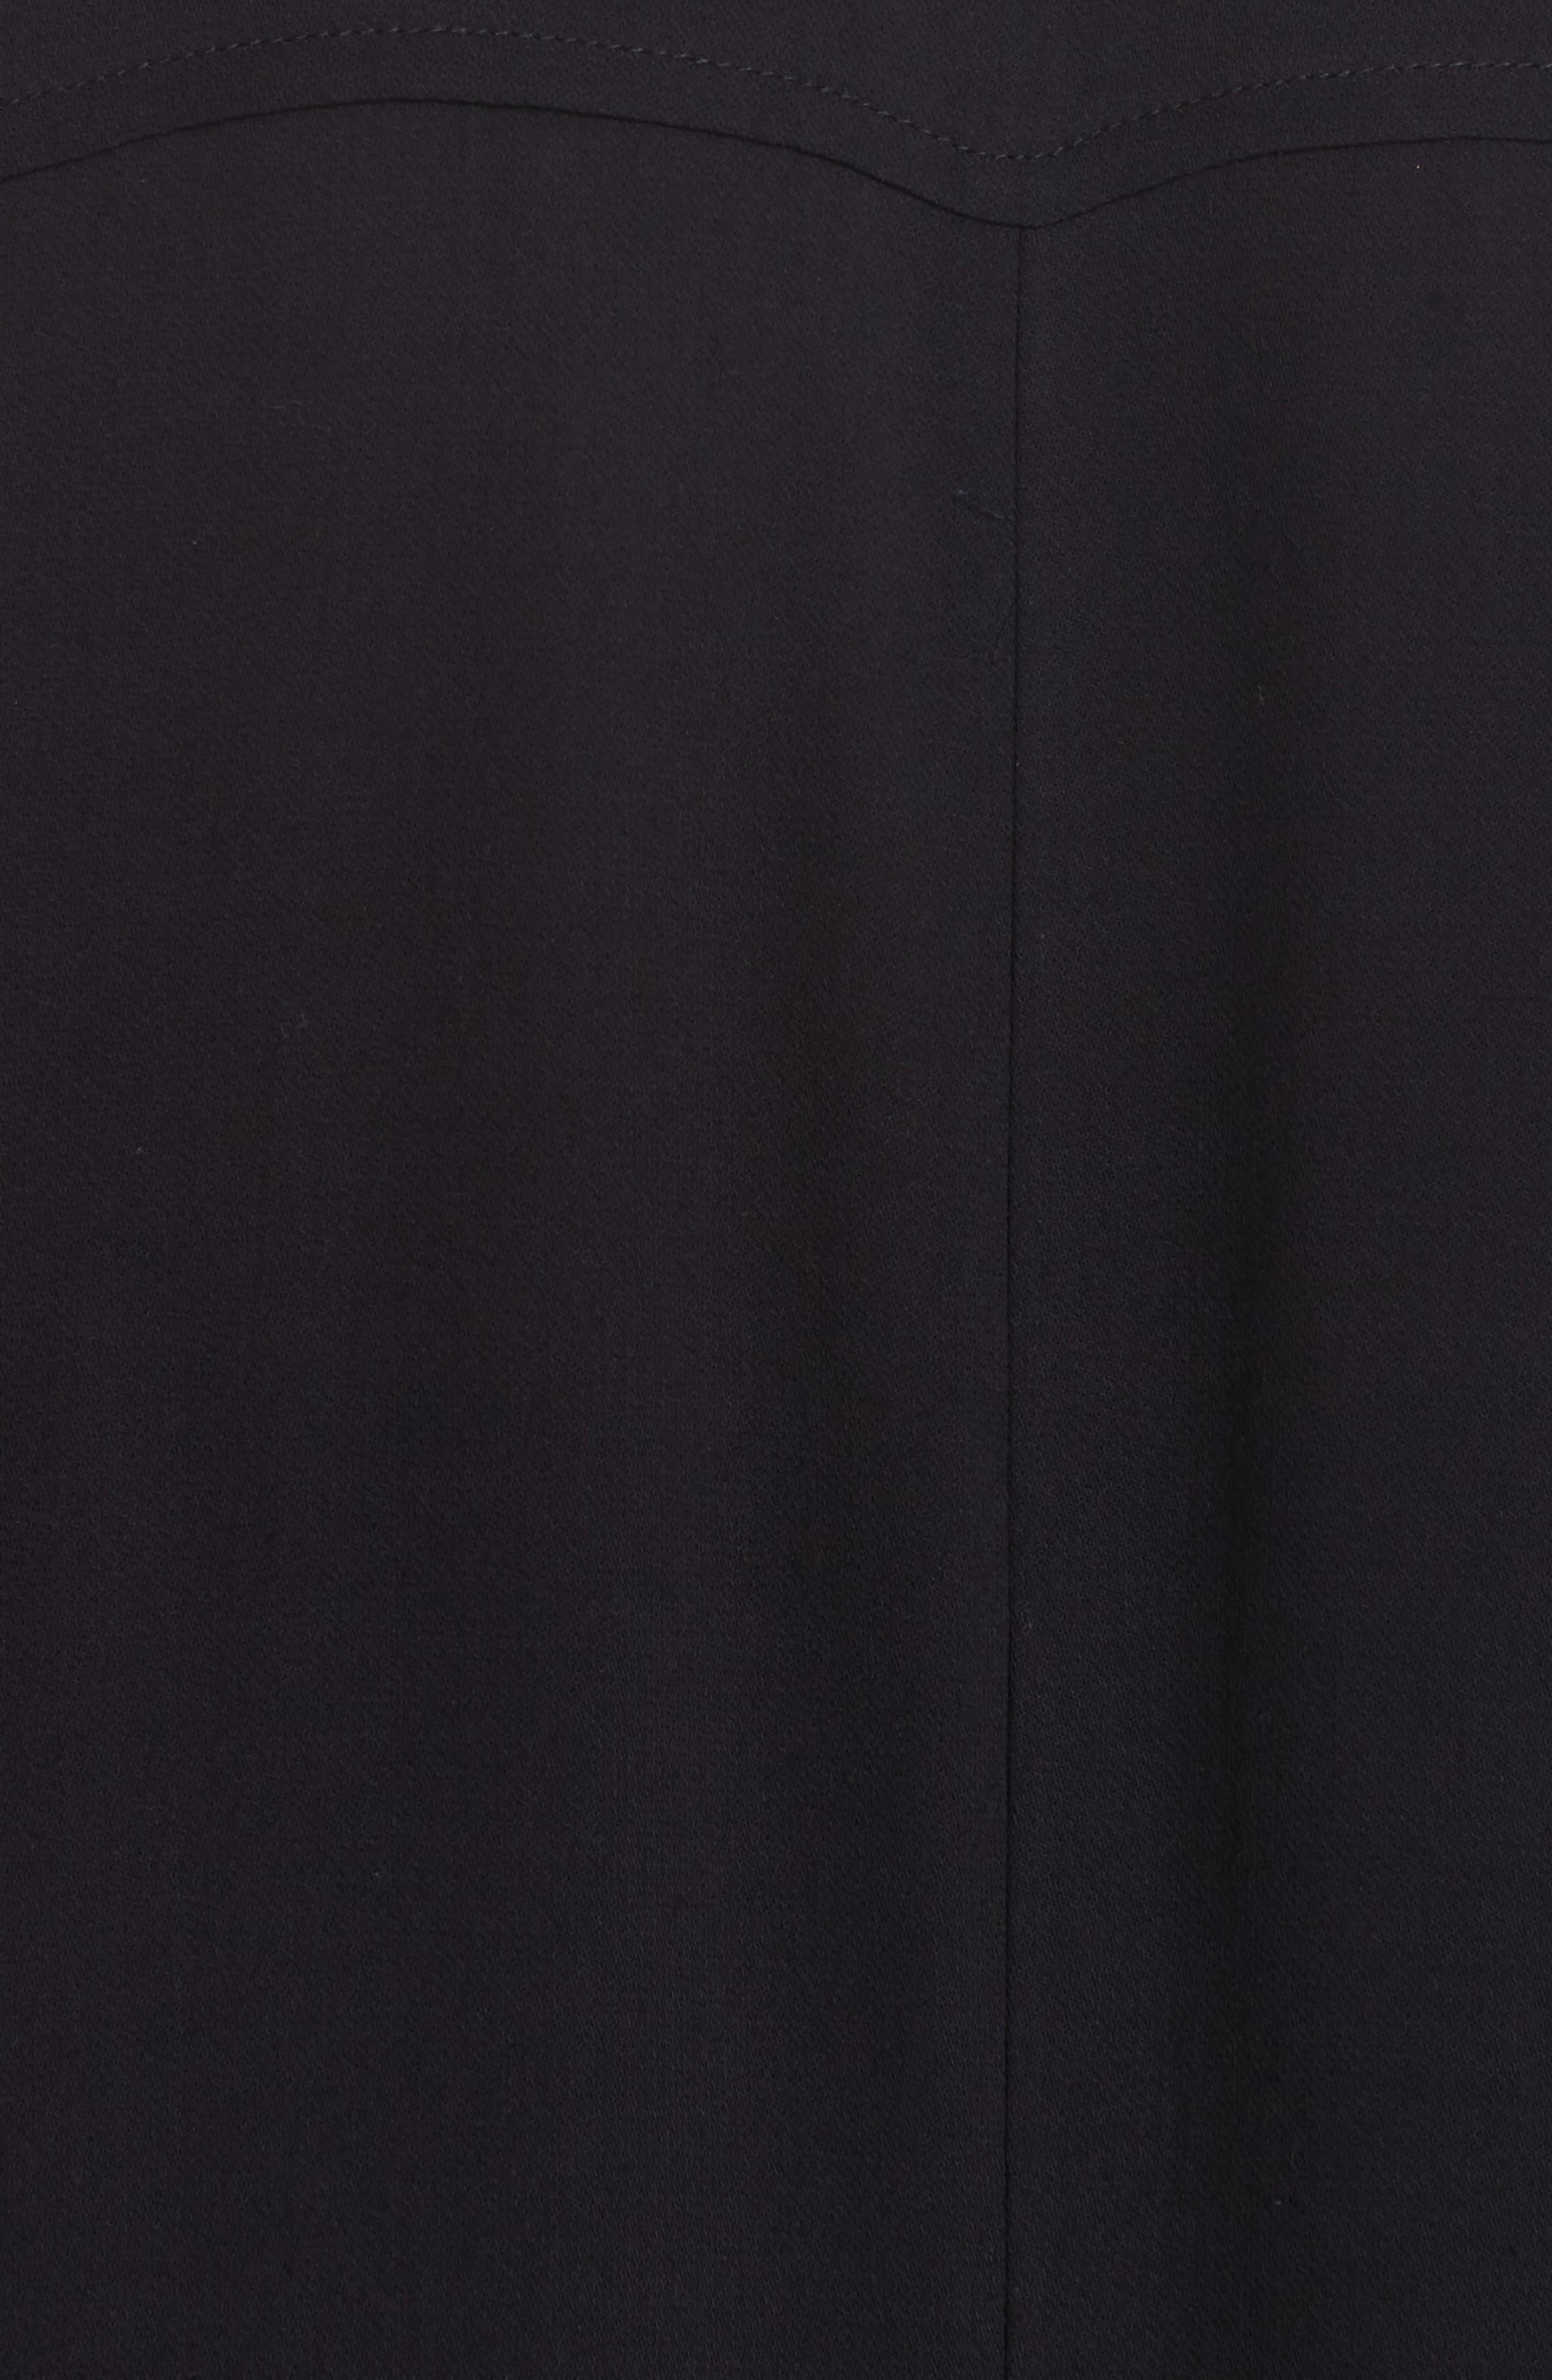 Maxi Shirtdress,                             Alternate thumbnail 6, color,                             001